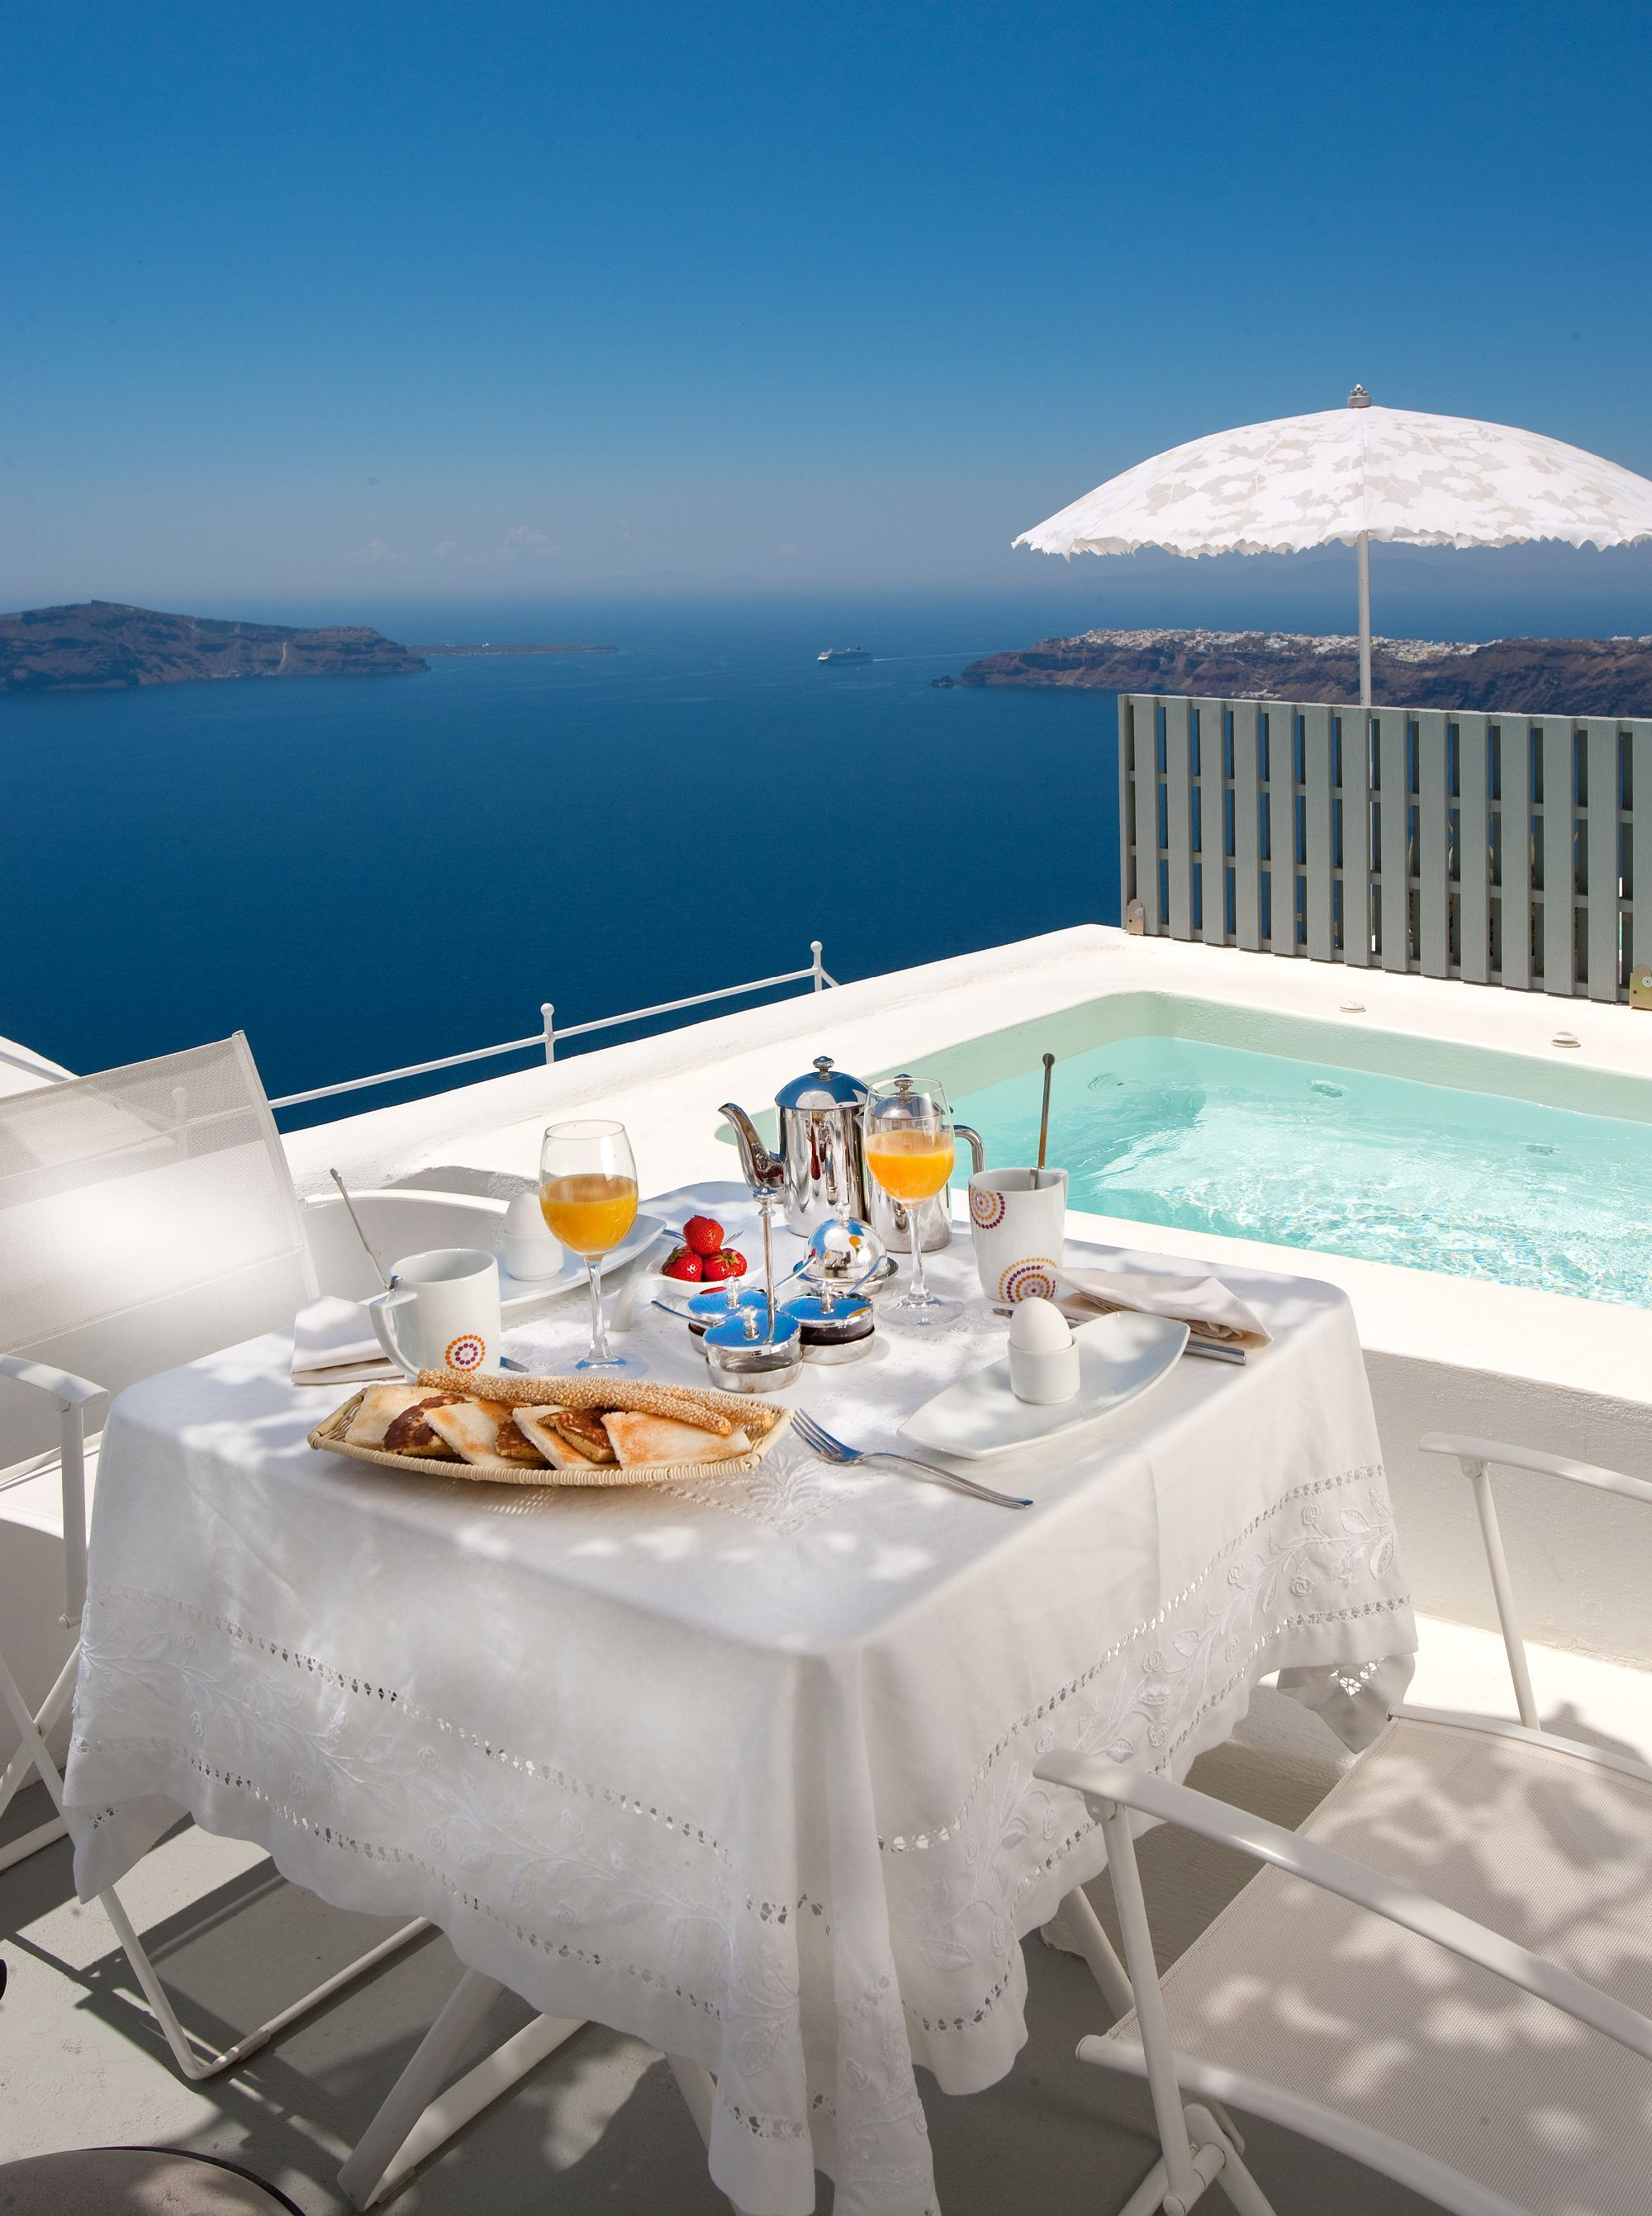 Fancy Mouth-watering Mediterranean Breakfast With